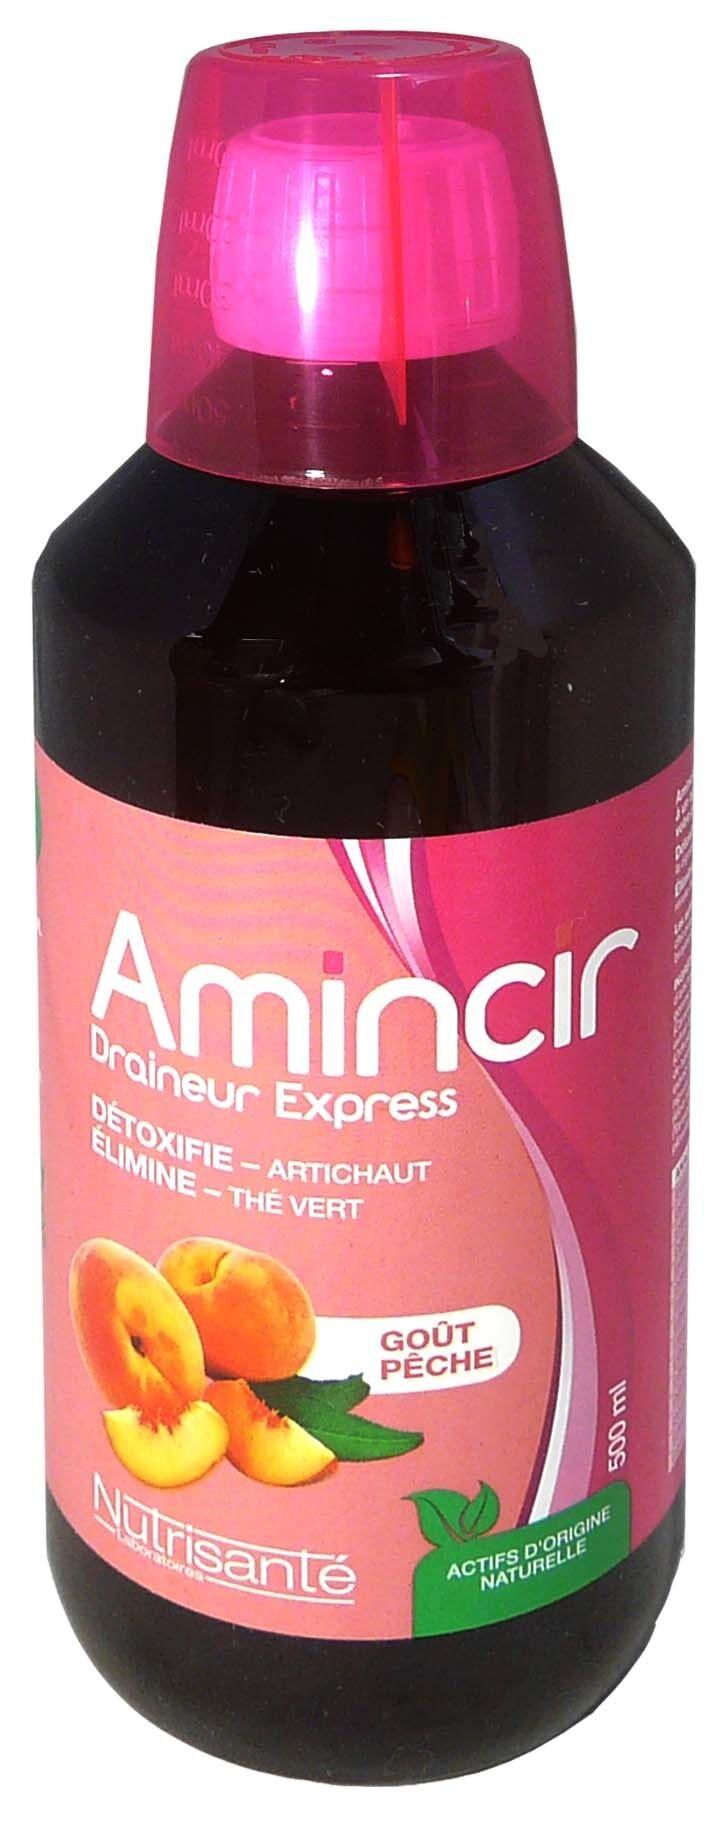 Nutrisante amincir draineur express gout peche 500ml